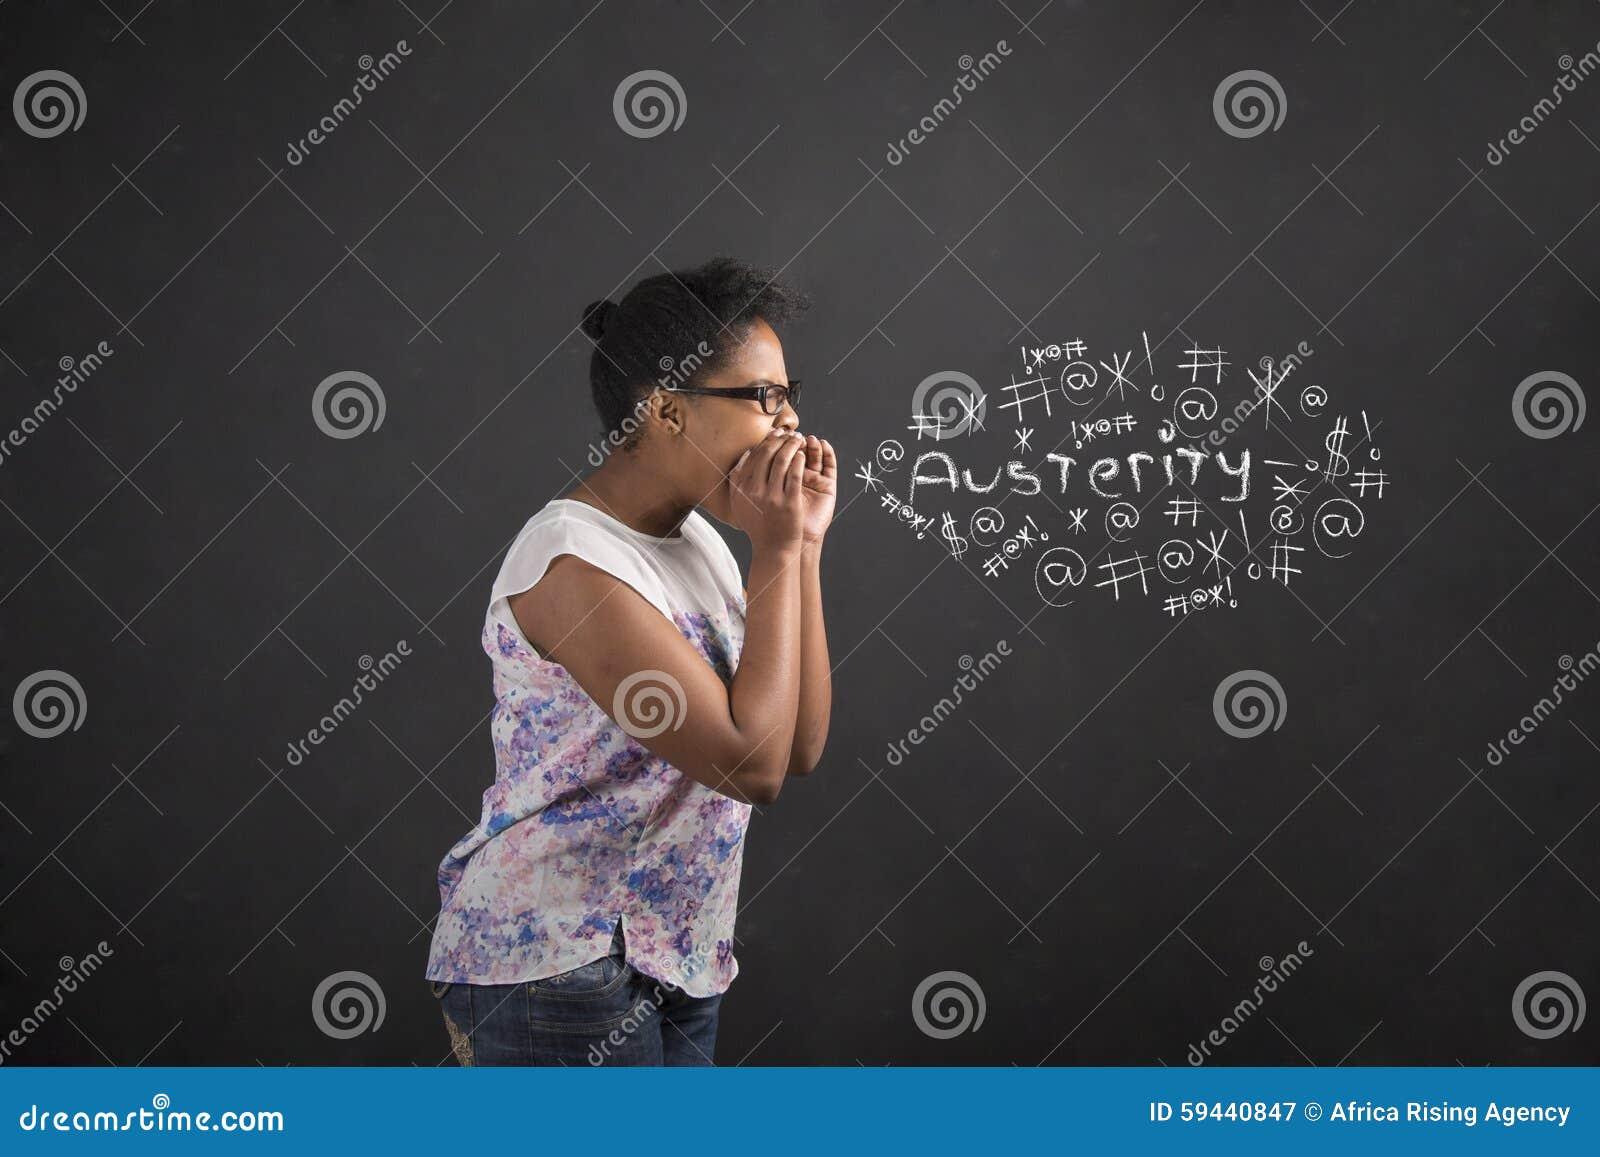 African American woman shouting, screaming or swearing austerity on blackboard background